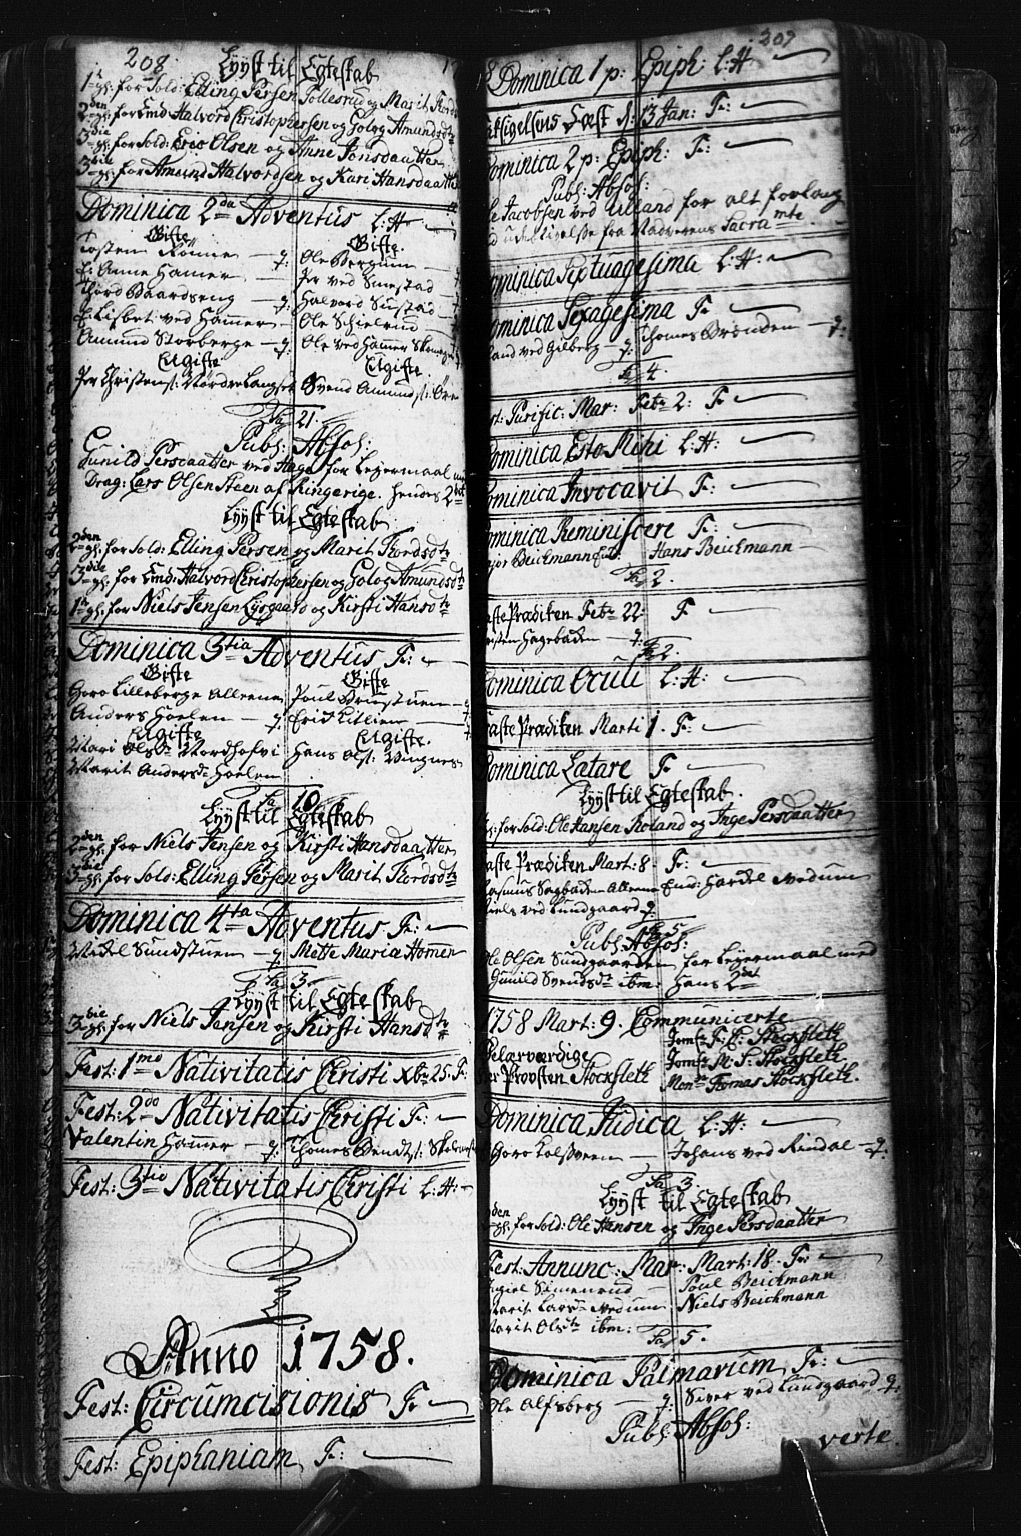 SAH, Fåberg prestekontor, Klokkerbok nr. 1, 1727-1767, s. 208-209